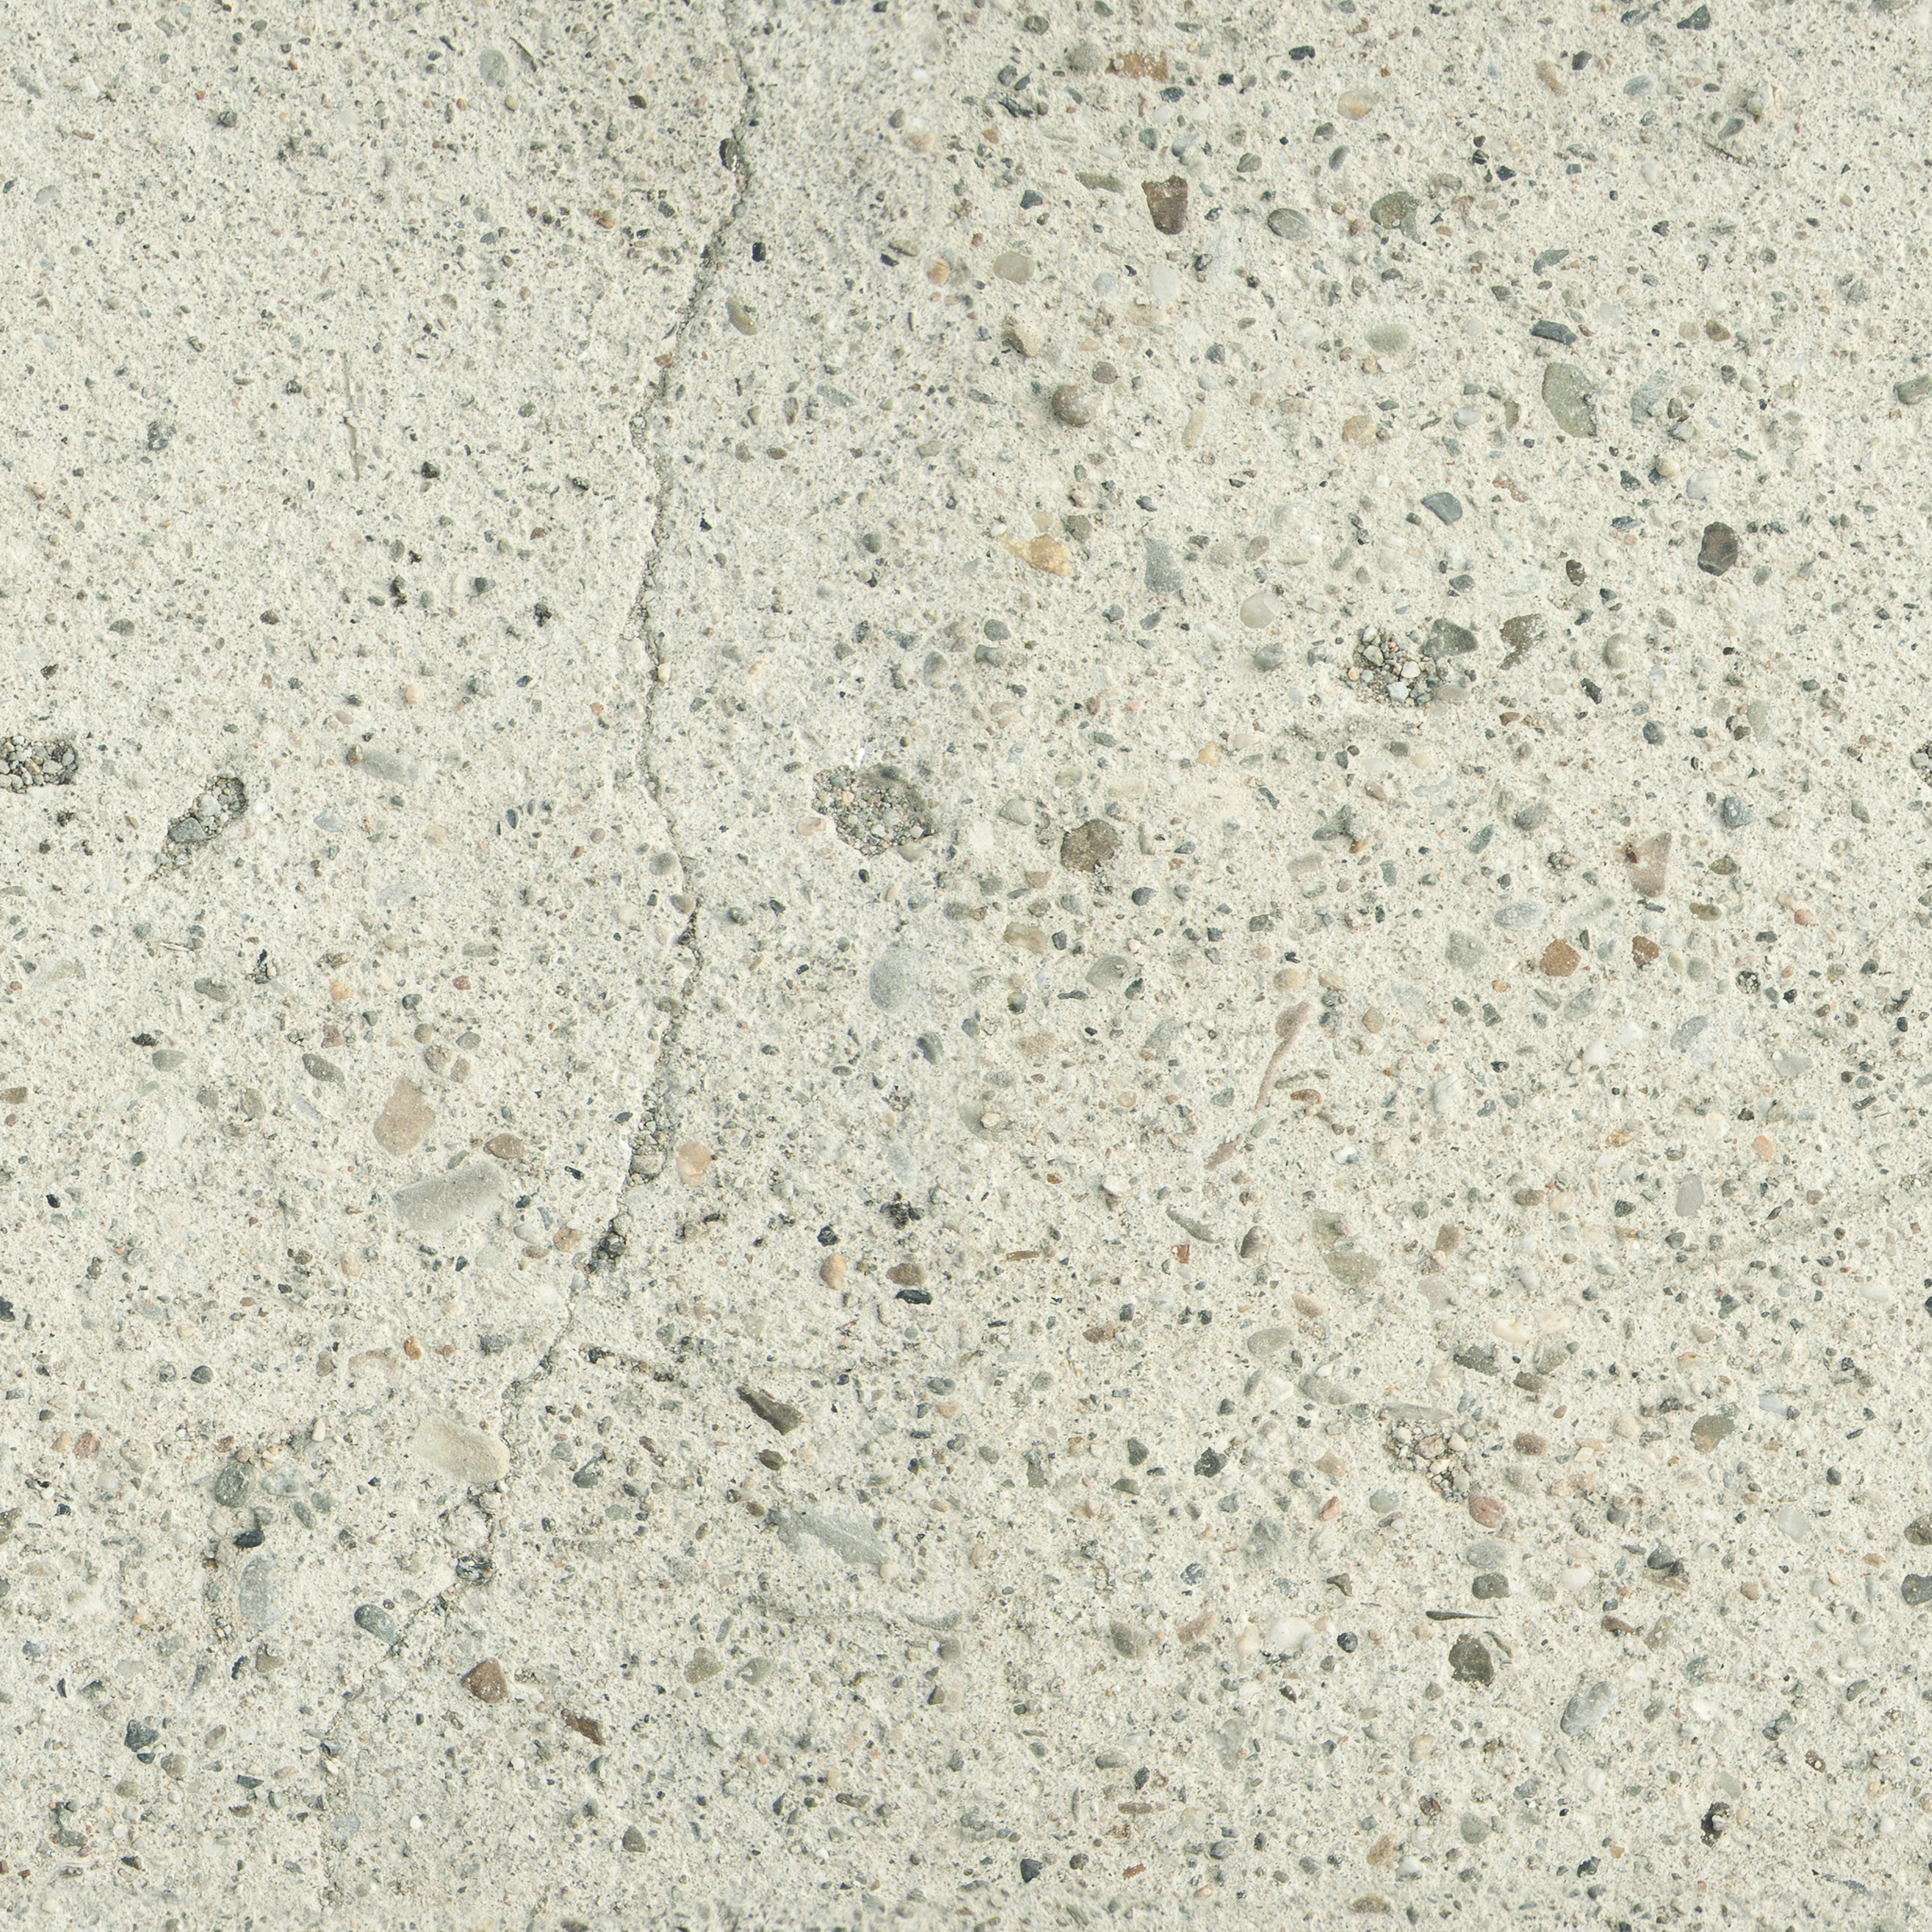 Cream Cracked Concrete.jpg